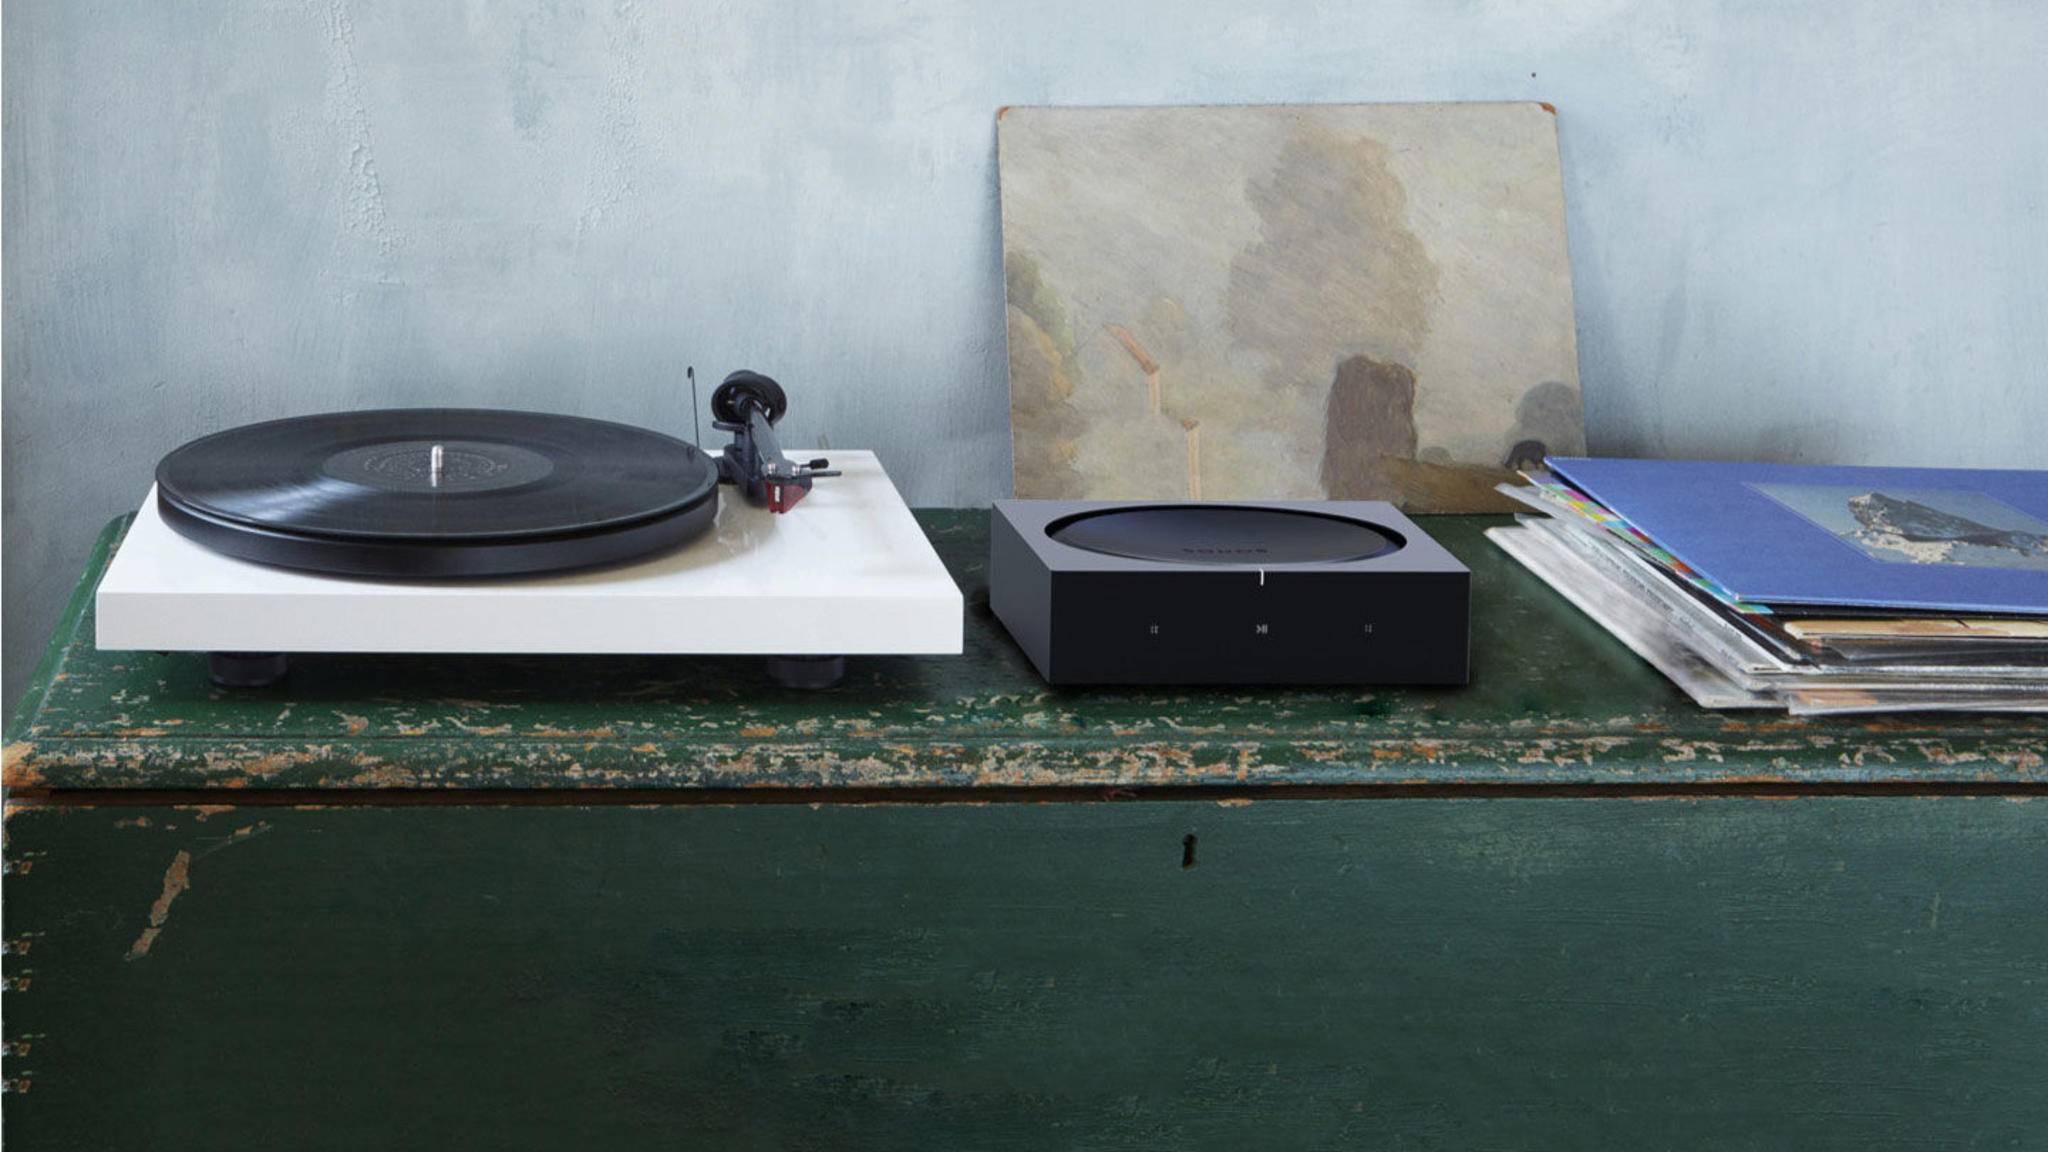 Alte Schallplattenspieler können ebenso an den Sonos Amp angeschlossen werden.